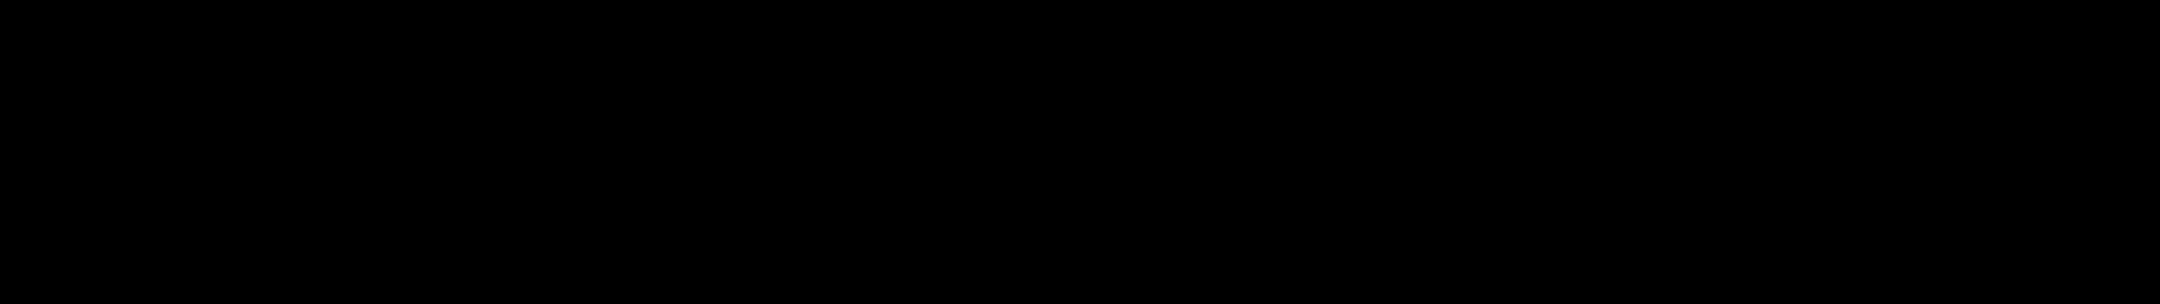 starzplay logo 1 - STARZPLAY Logo